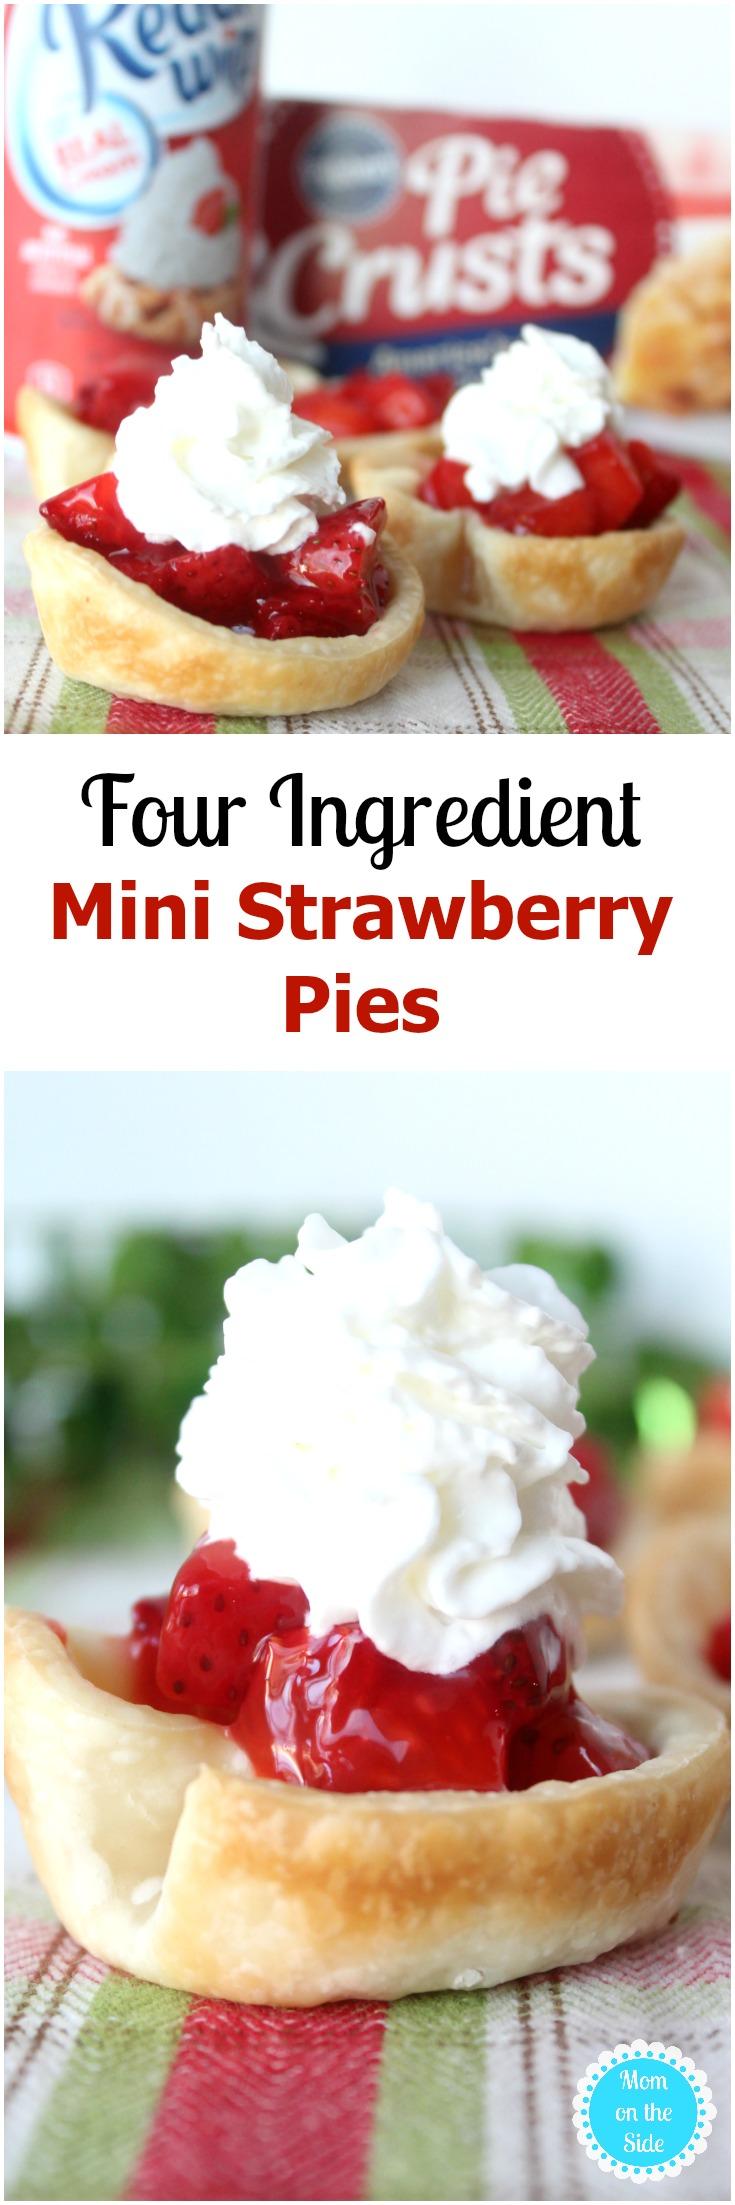 Santa Hat Desserts - Mini Strawberry Pies made with Pillsbury Refrigerated Pie Crust and Reddi-wip